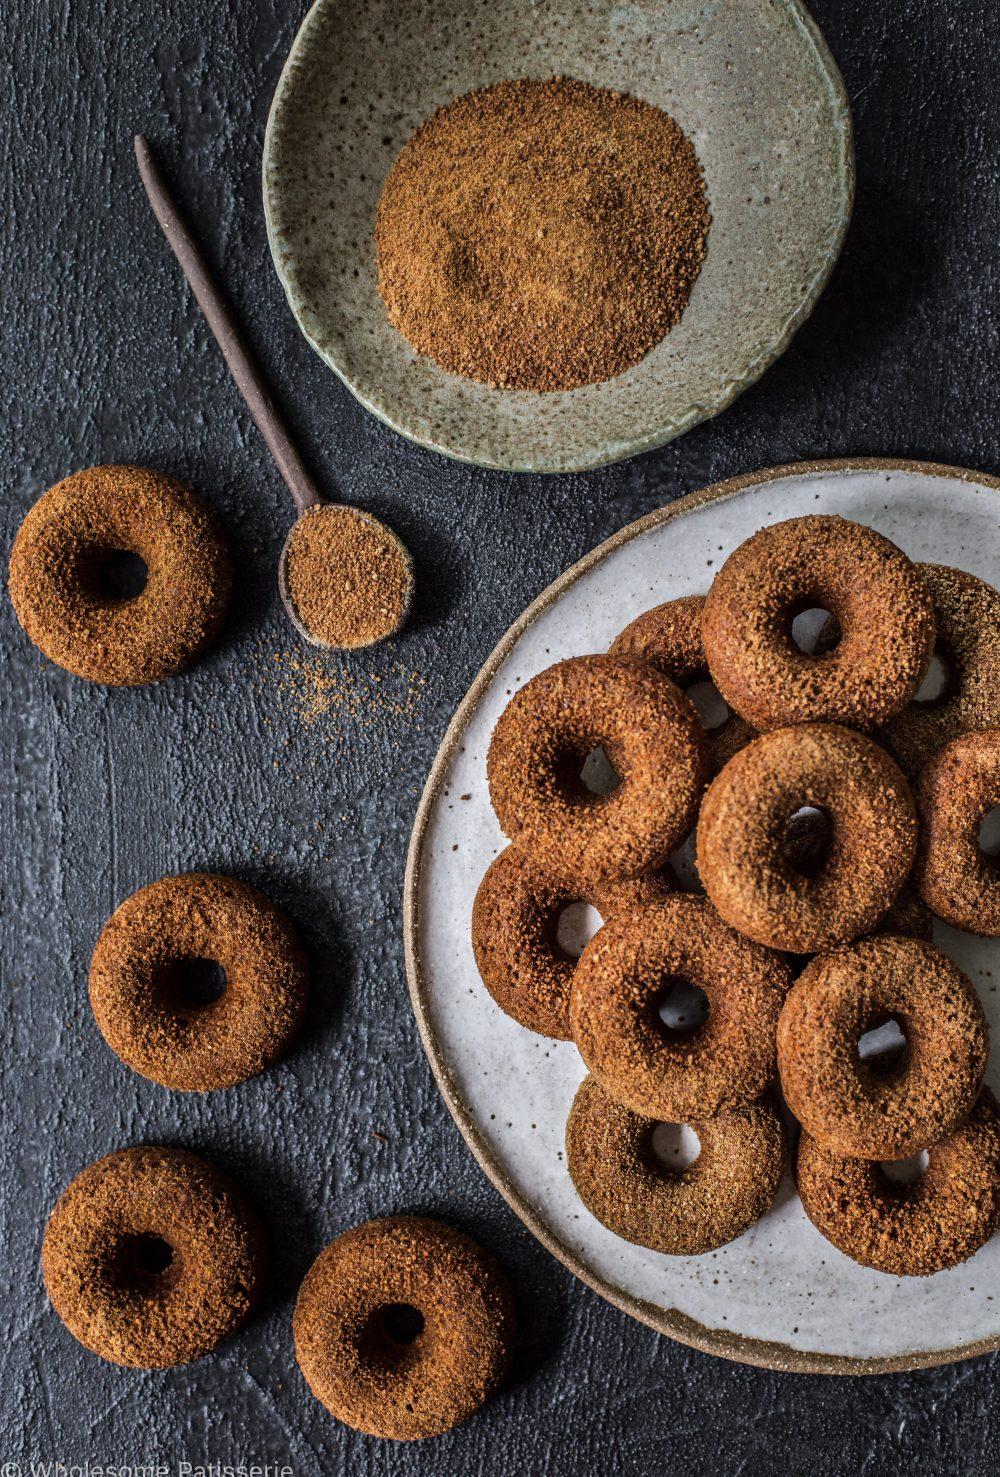 cinnamon-sugar-donuts-vegan-gluten-free-refined-sugar-free-baked-not-fried-easy-kids